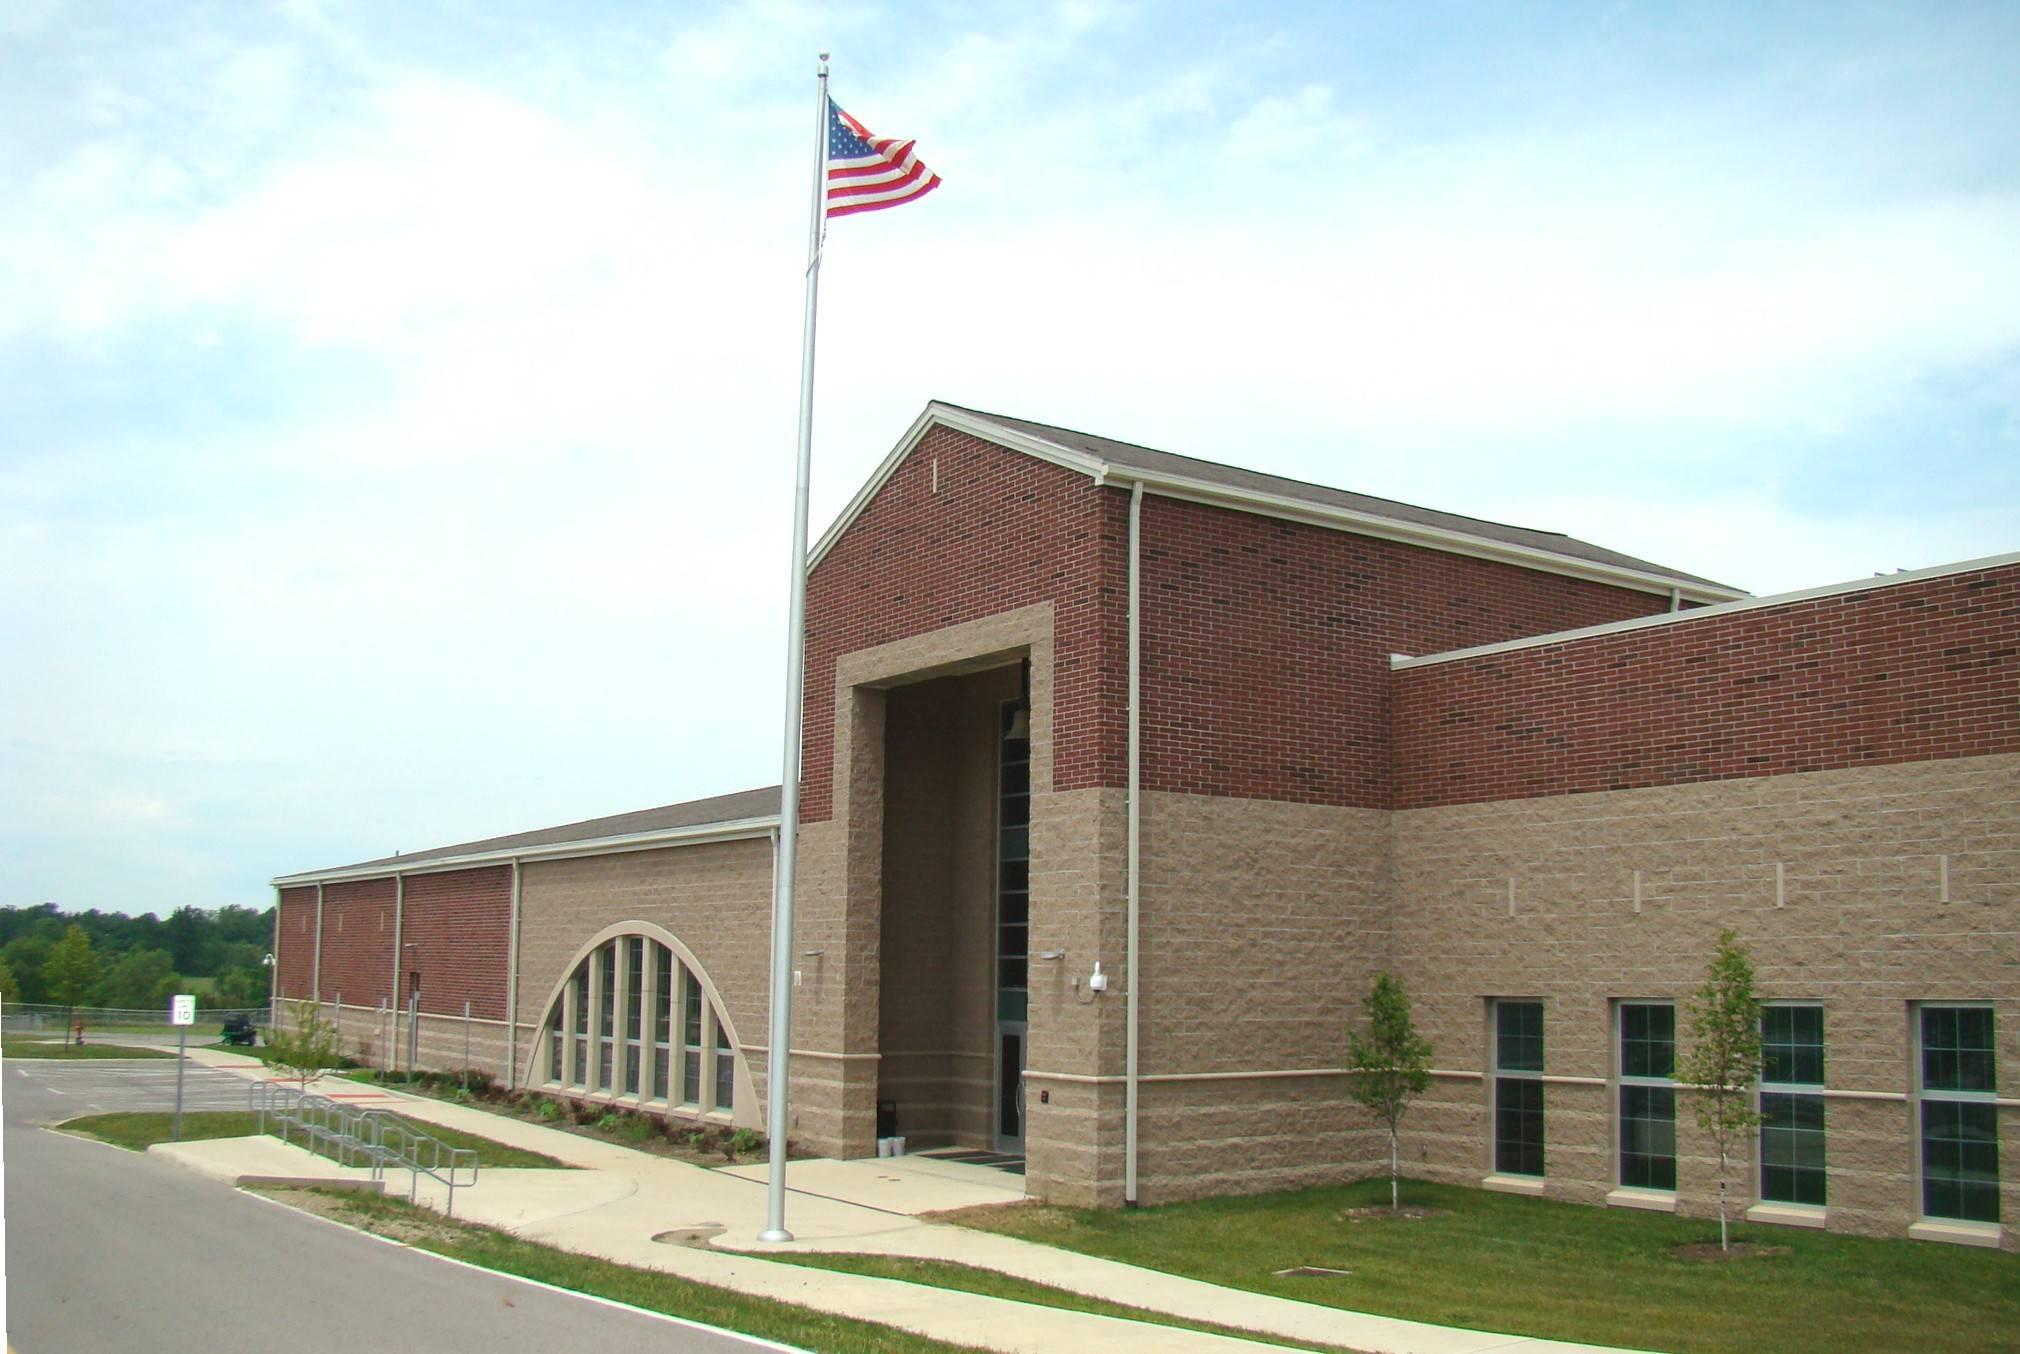 Mechanicsburg Secondary School